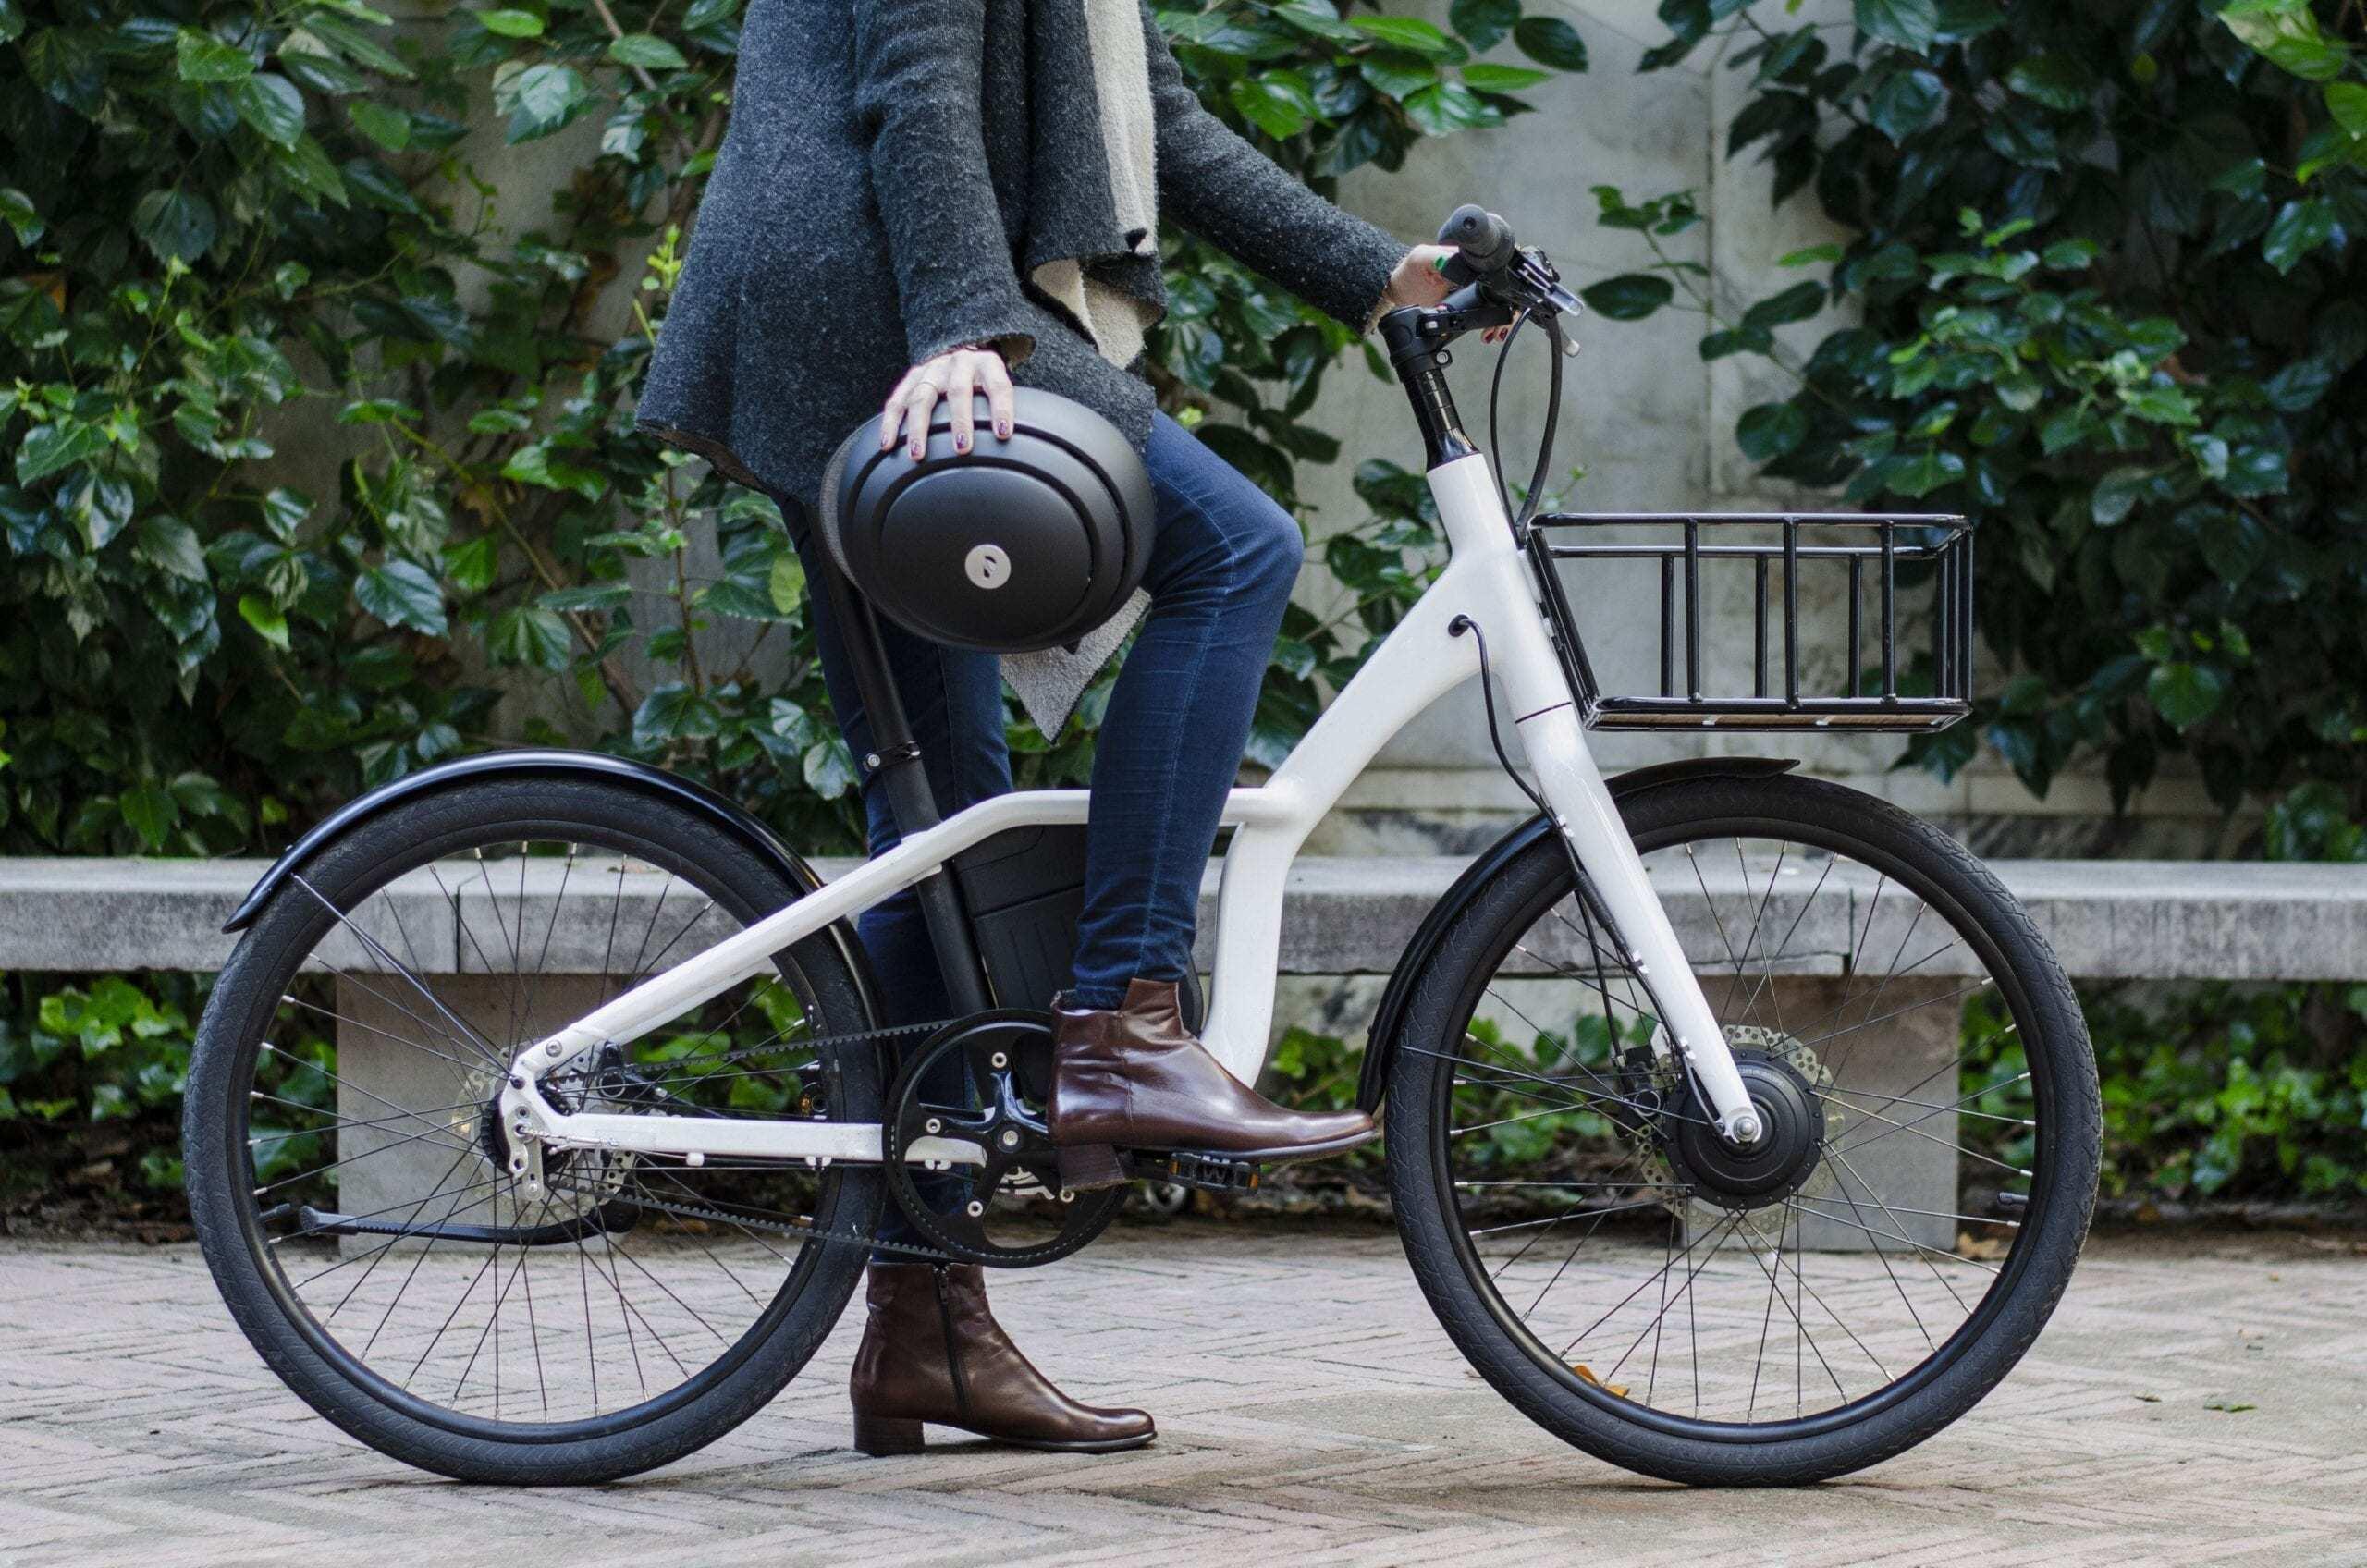 Talla bicicleta urbana